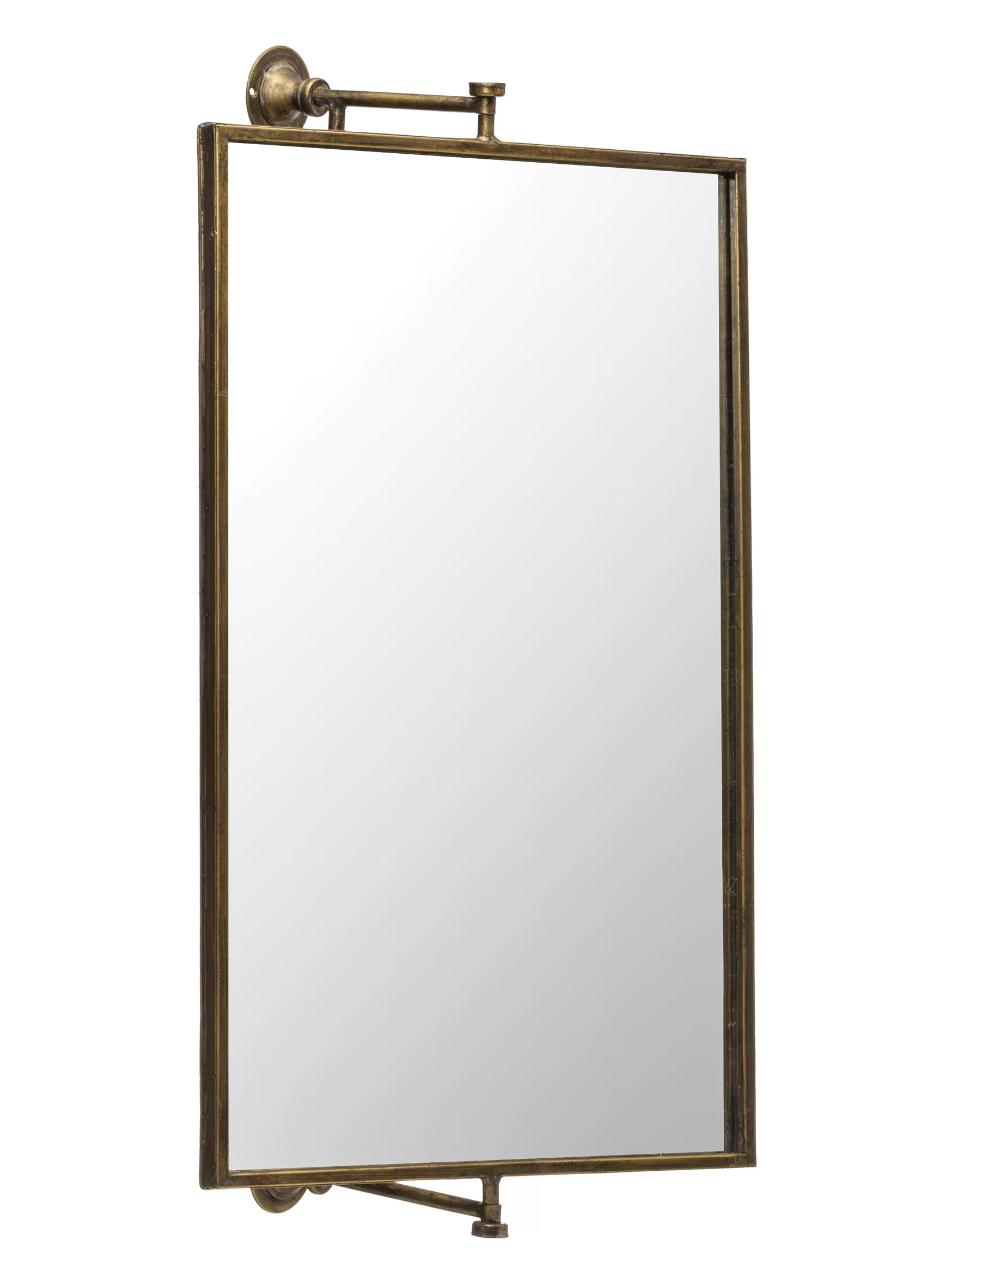 16 Cjm Ideas Bathroom Design Bathroom Interior Bathroom Decor